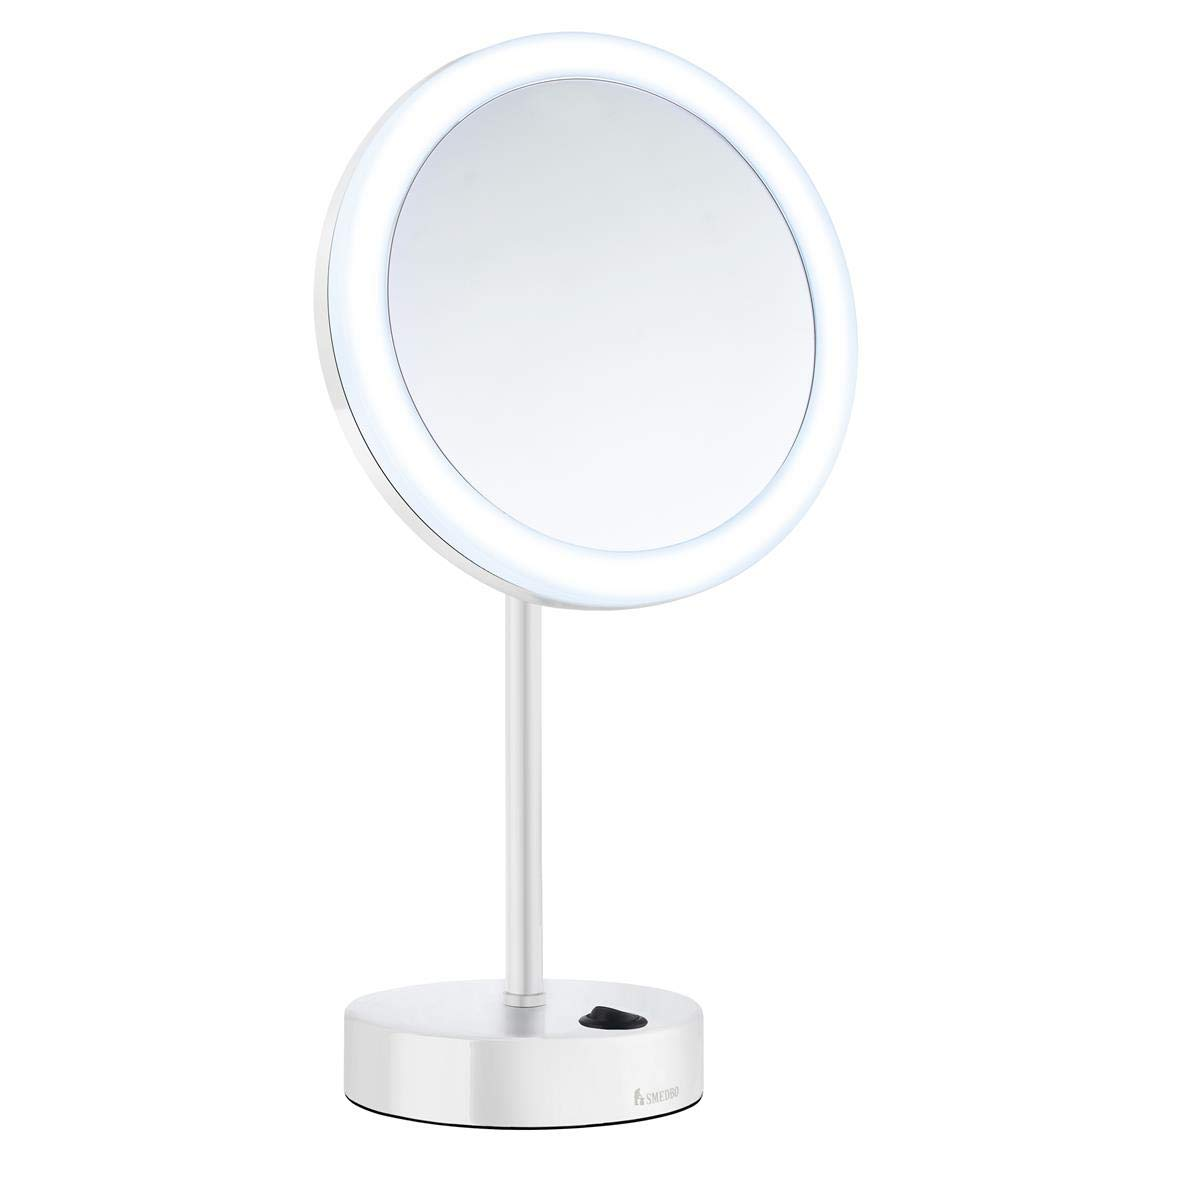 SMEDBO OUTLINE Kosmetikspiegel 5-fach Vergrößerung Dual Light LED LED LED Touch weiß FK484EW 9c6627